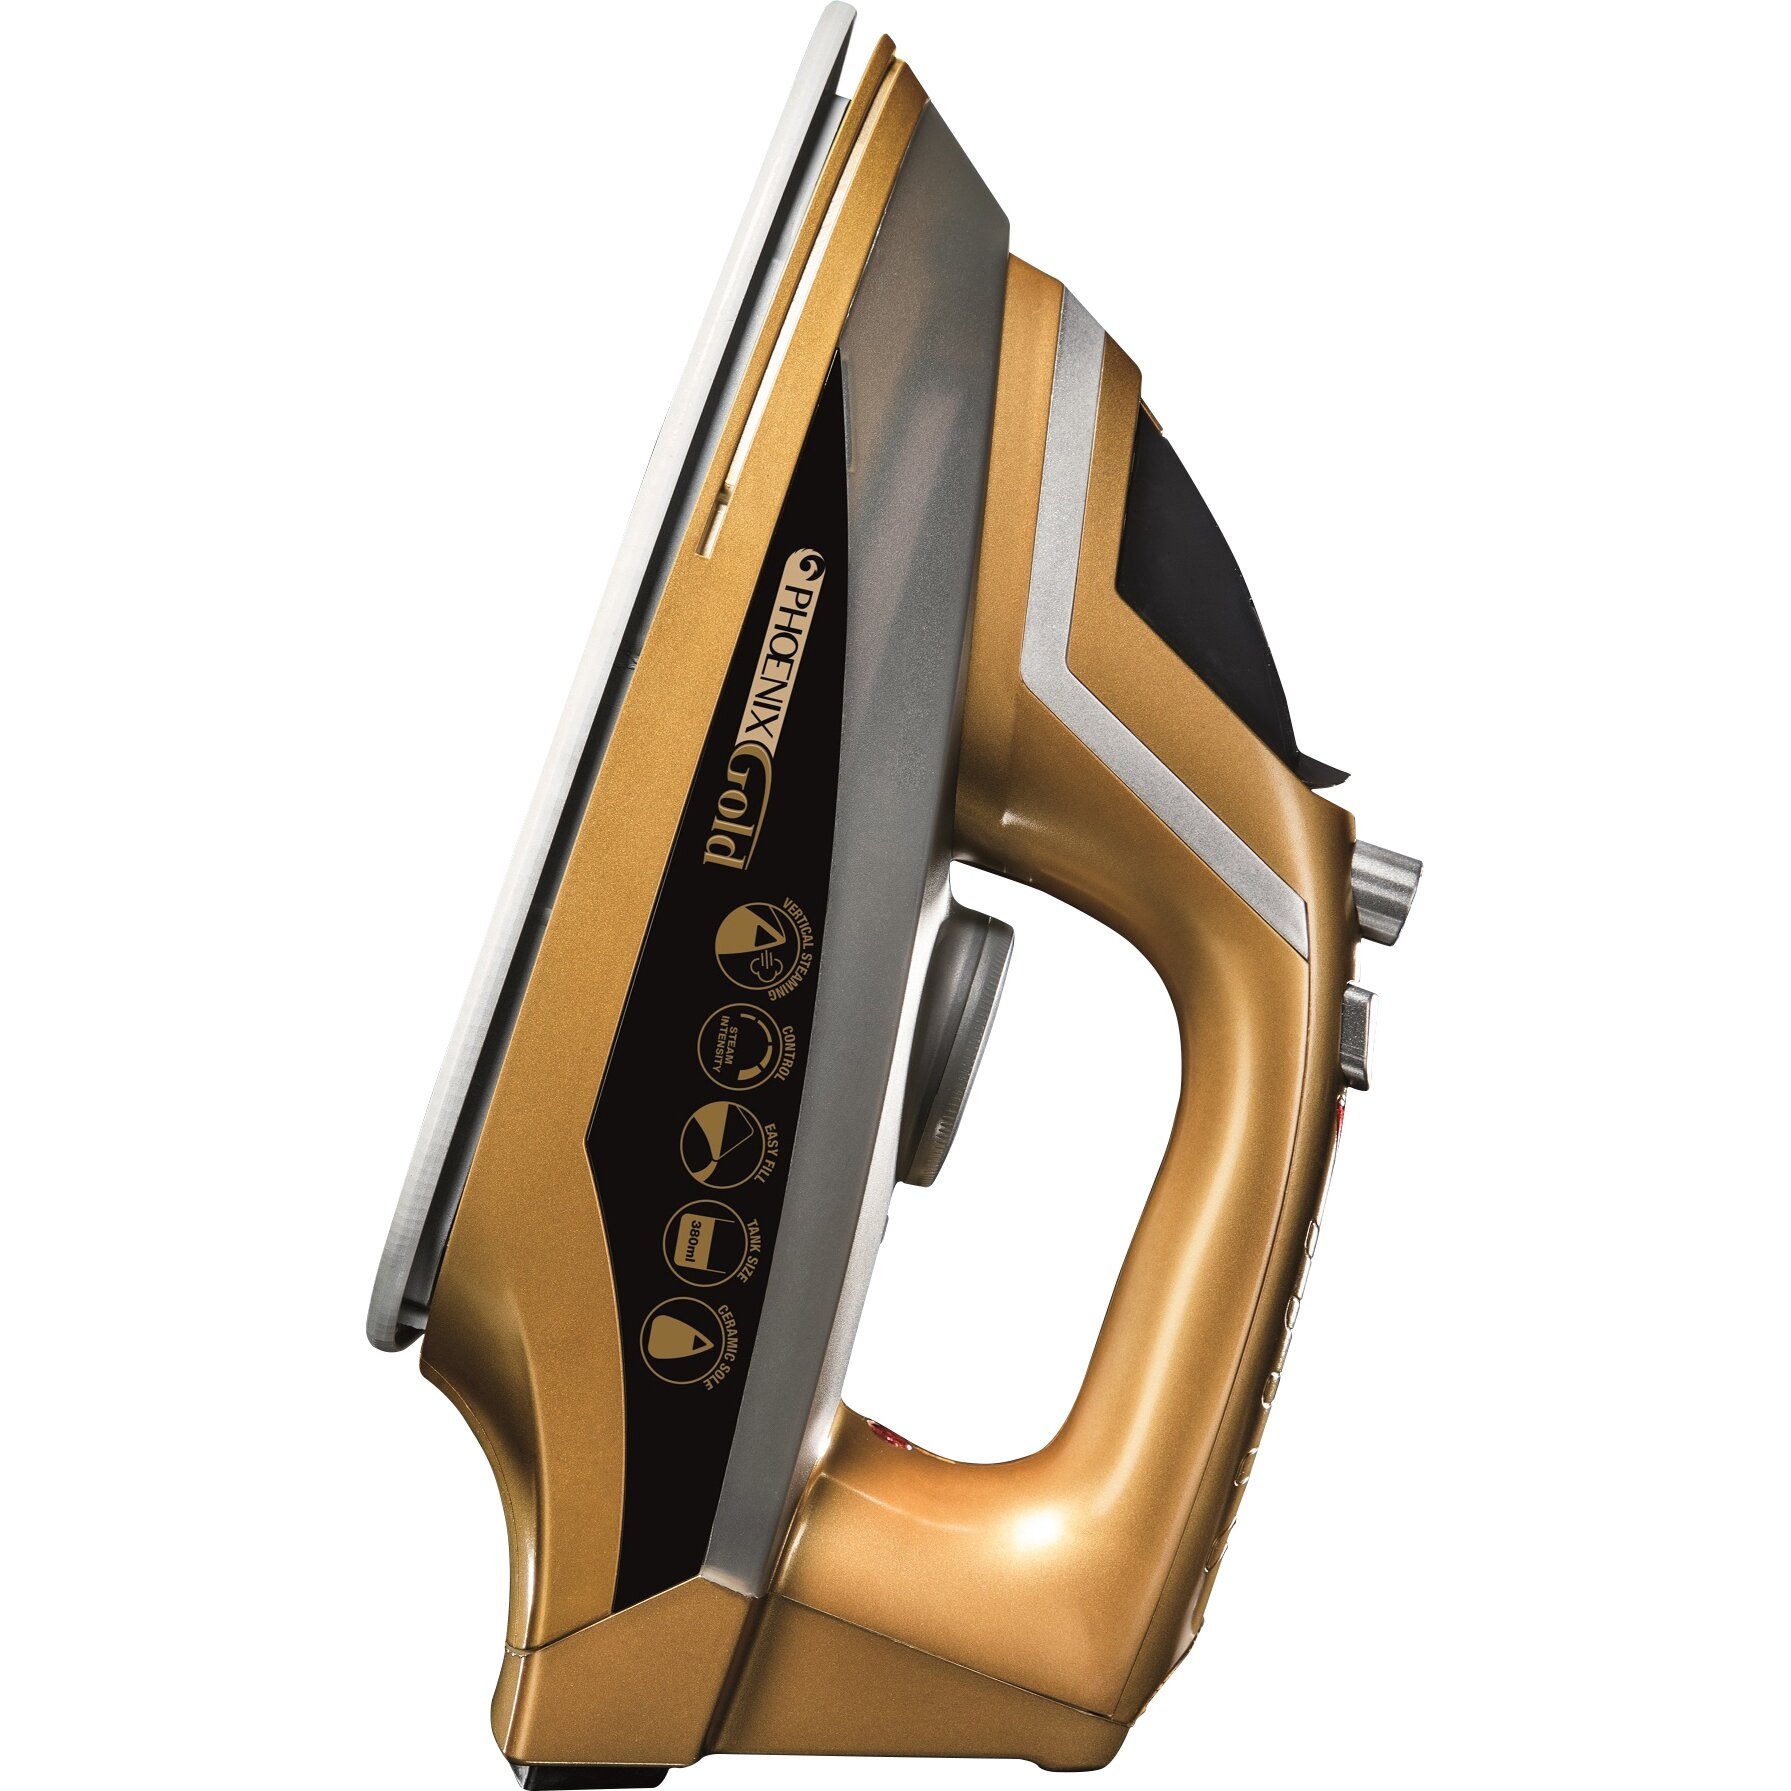 phoenix gold by jml phoenix gold 2200w iron wayfair uk. Black Bedroom Furniture Sets. Home Design Ideas